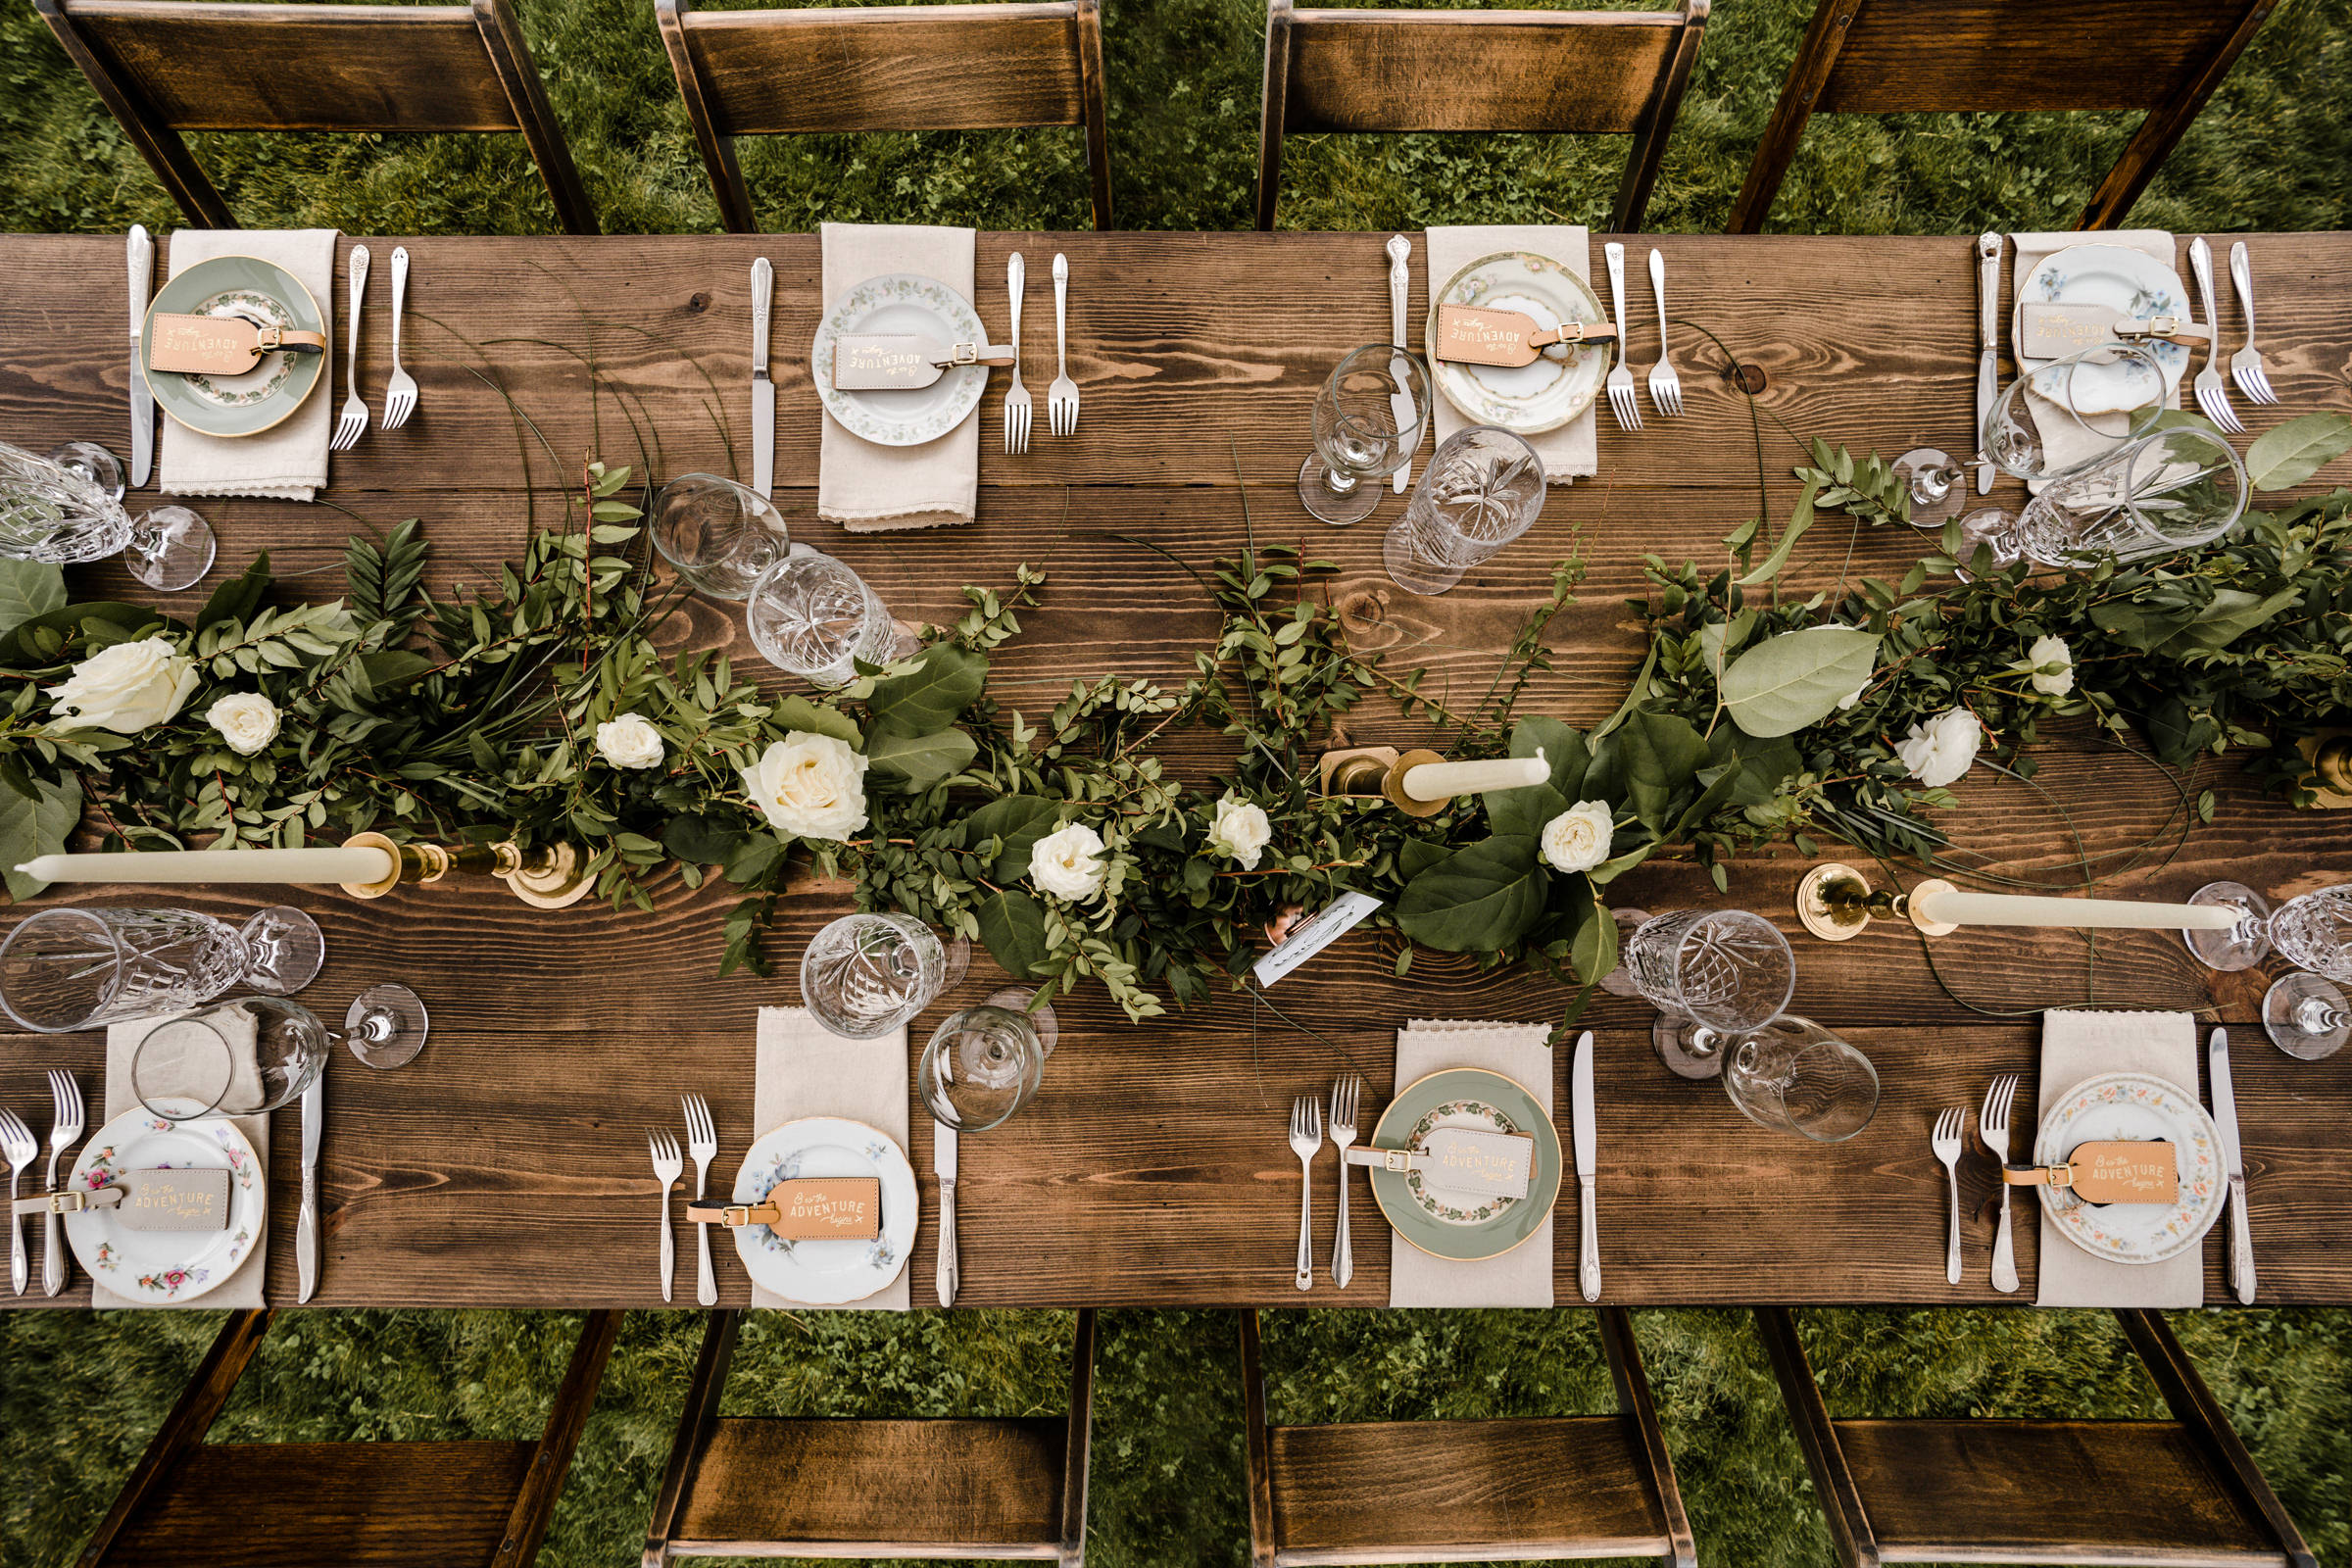 Top down tablescape - photo by Sasha Reiko Photography